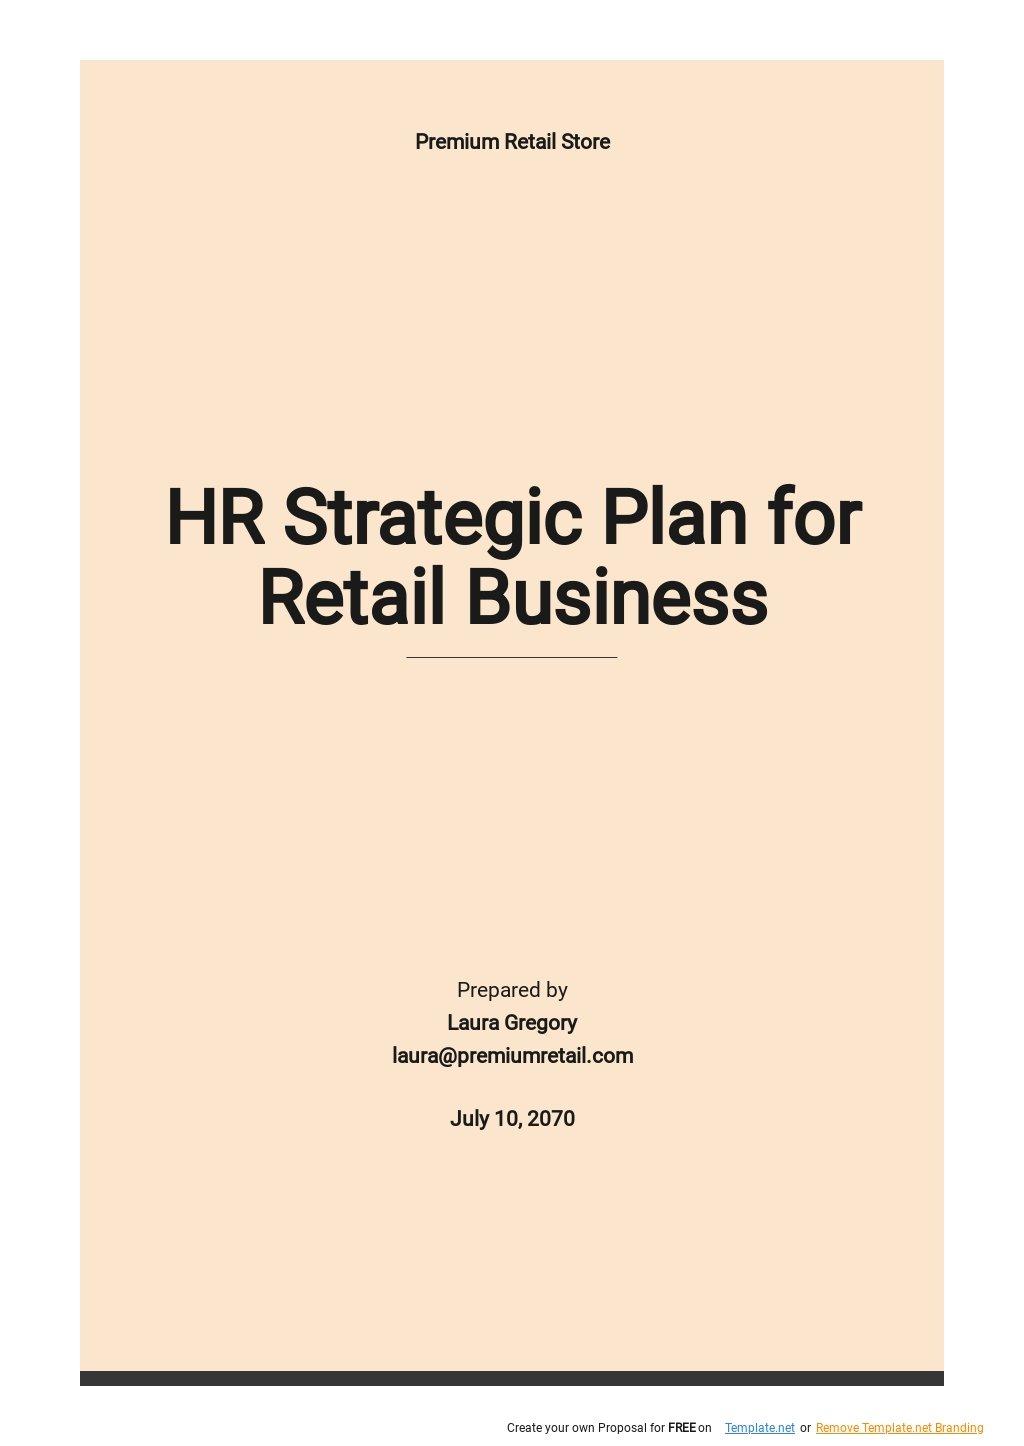 HR Strategic Plan Template for Retail Business .jpe